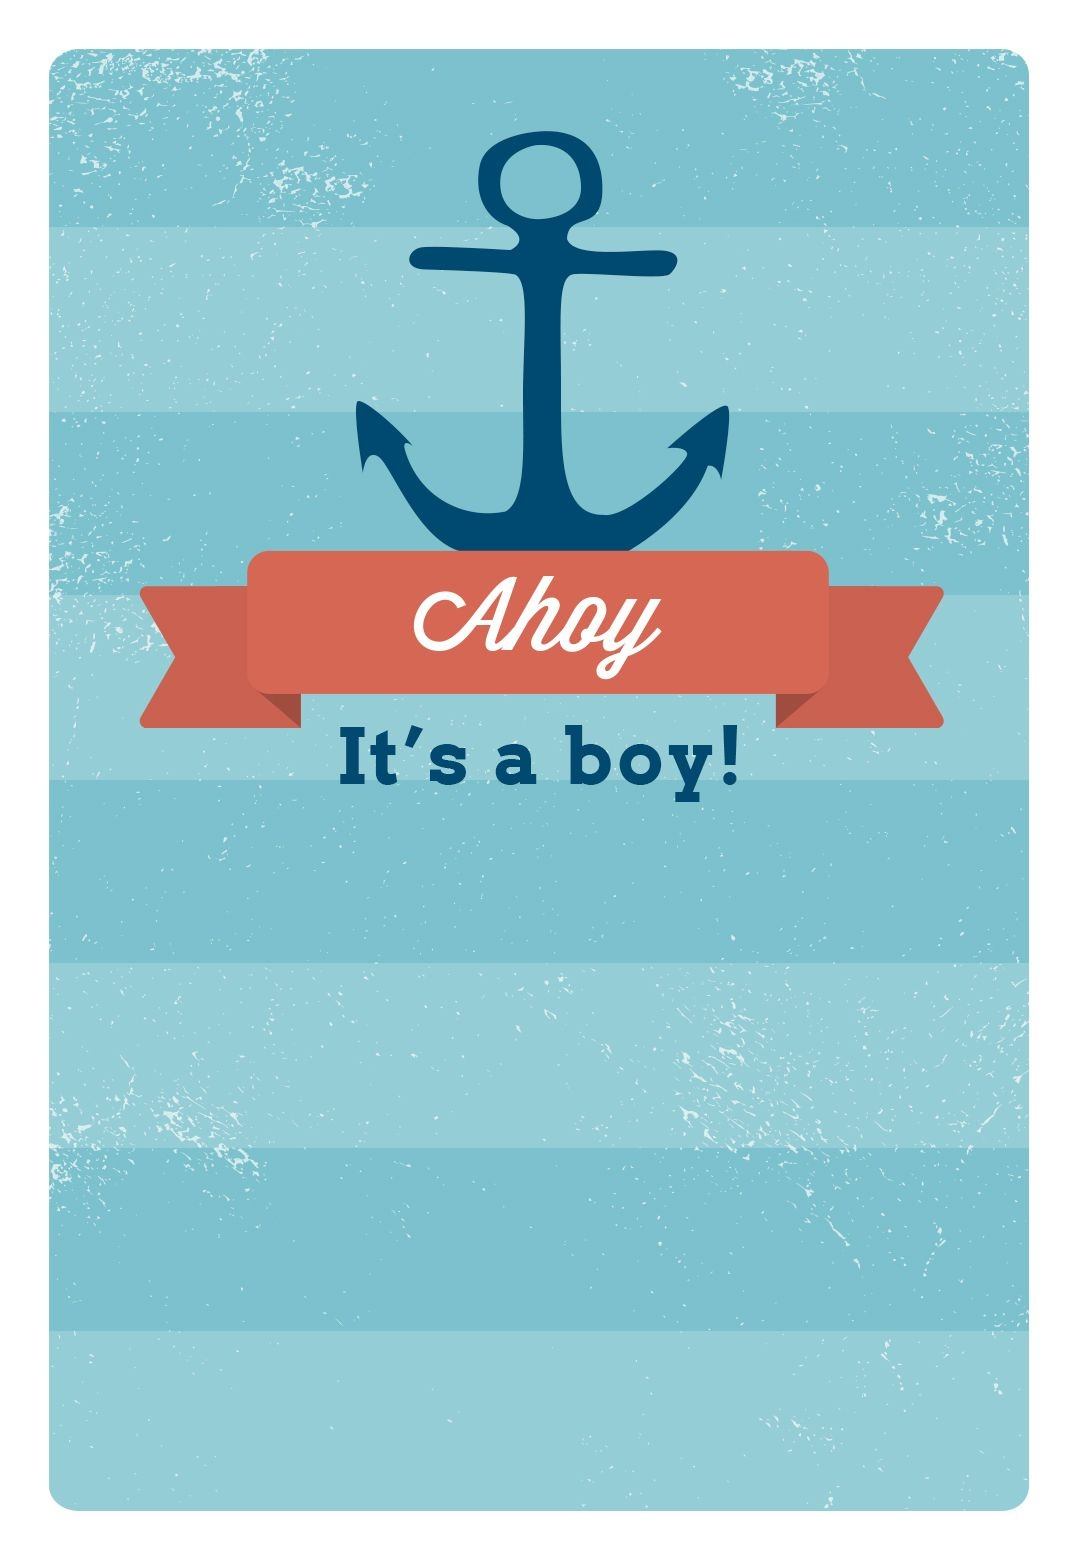 Free Printable Baby Shower Invitation - Ahoy It's A Boy | Greetings - Free Printable Baby Shower Invitation Maker